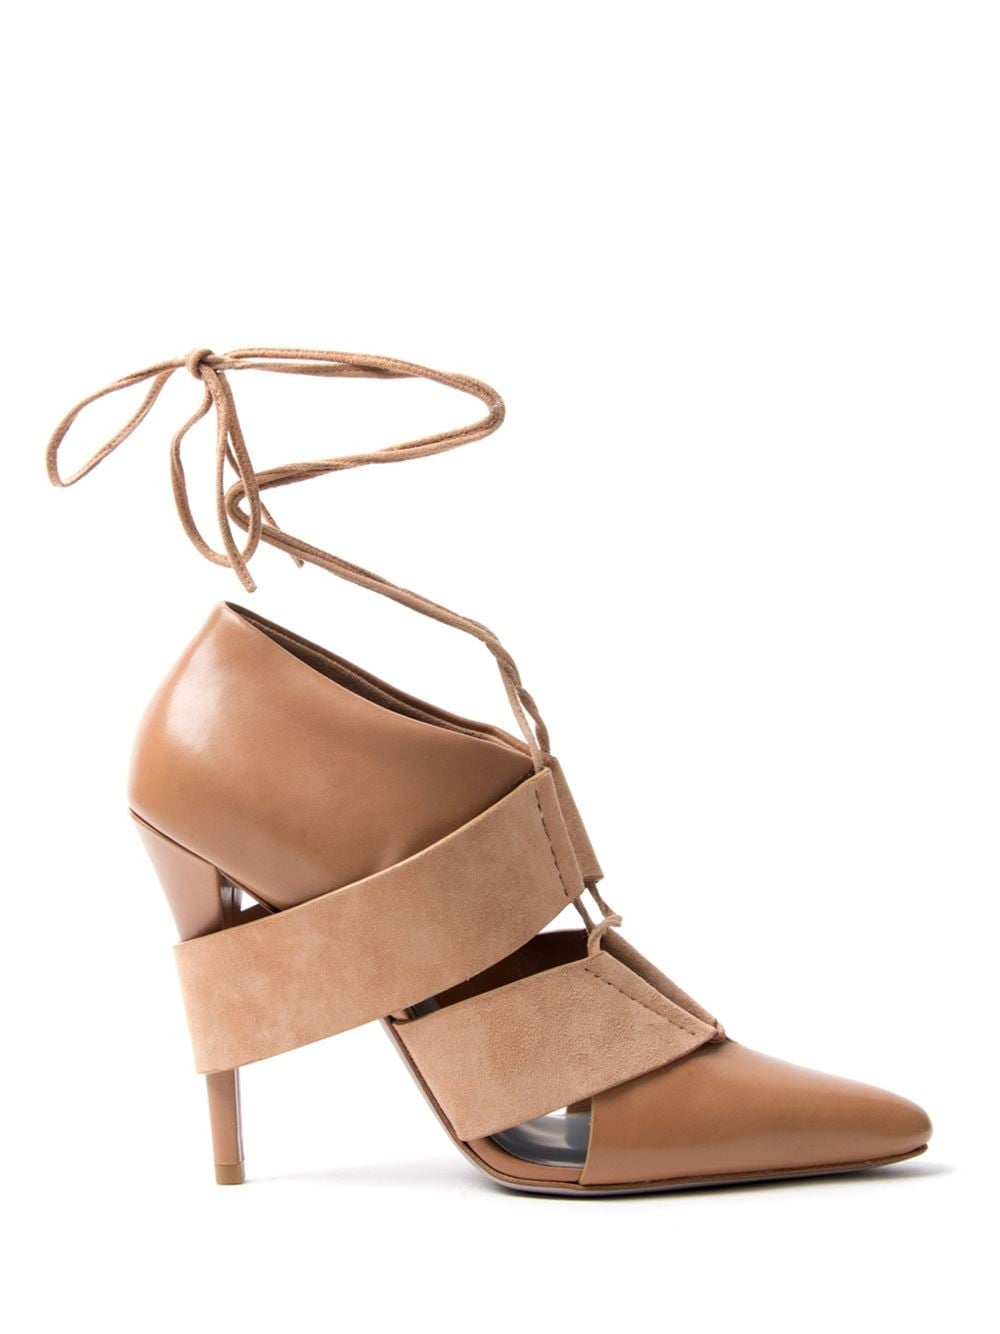 Breathable Closed-Toe Heels